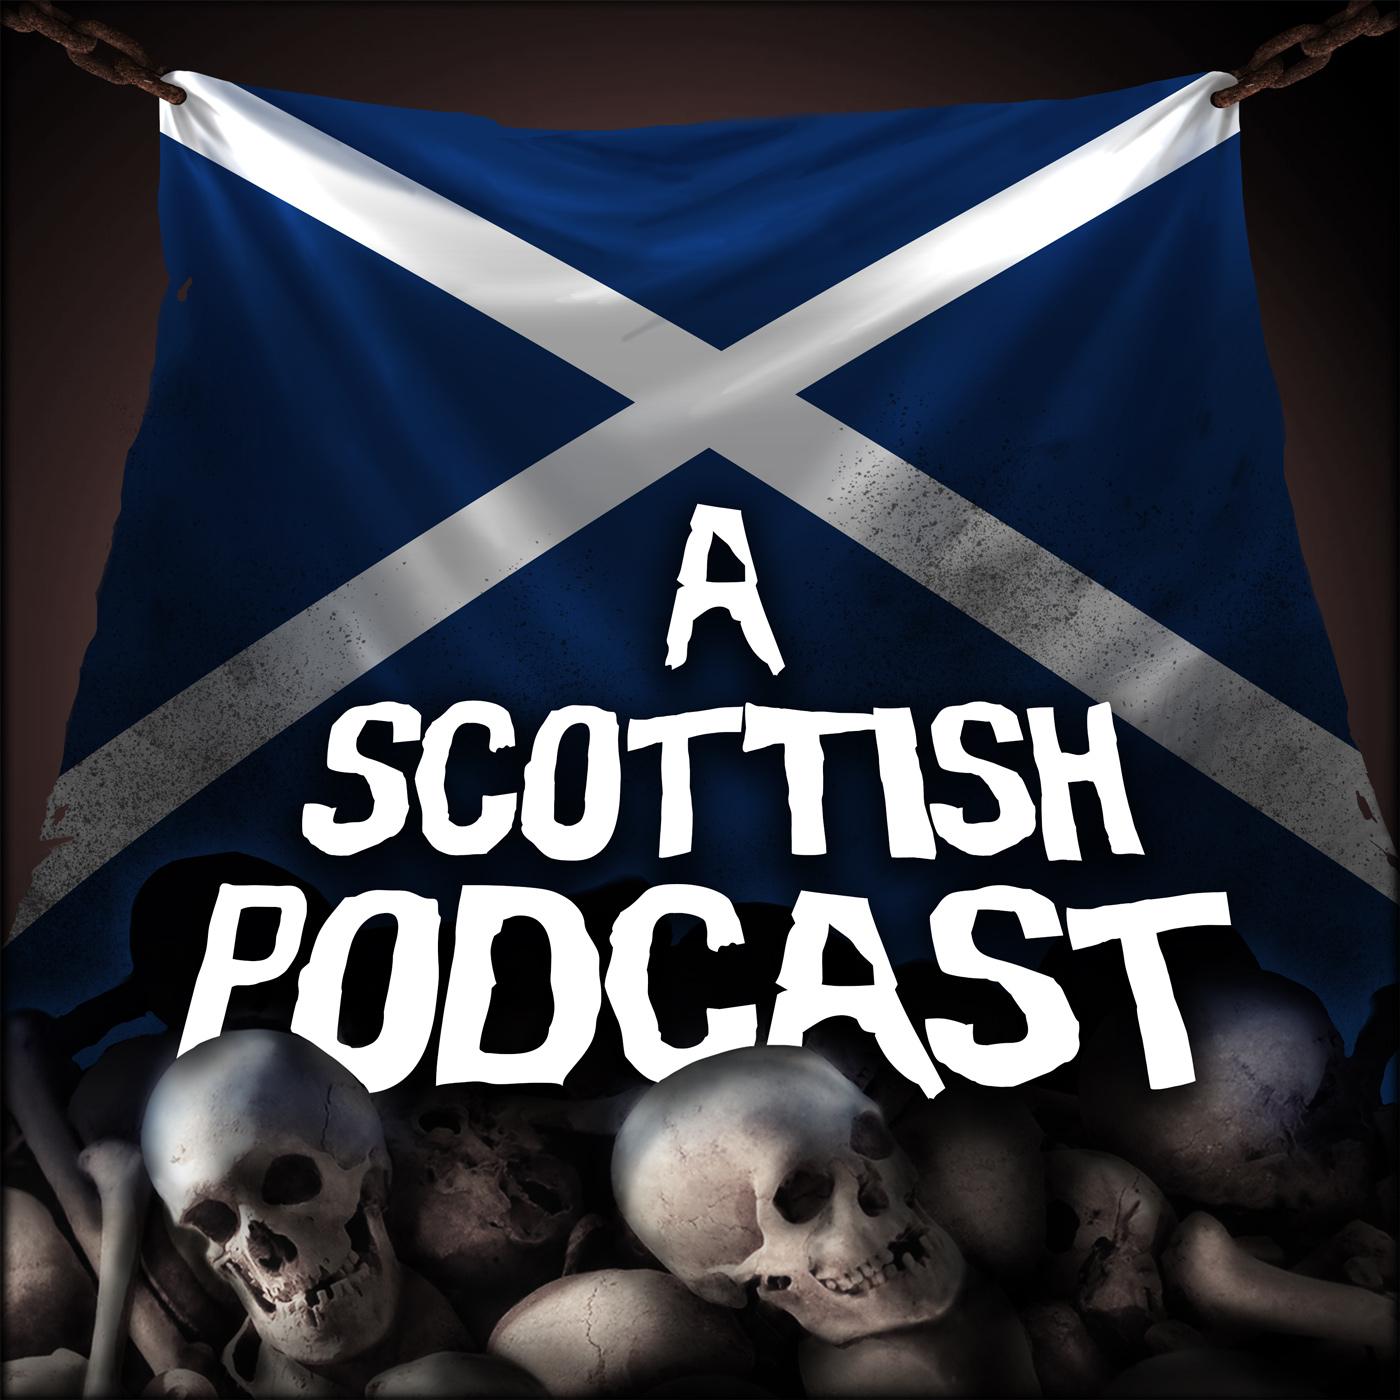 A Scottish Podcast - The Audio Drama